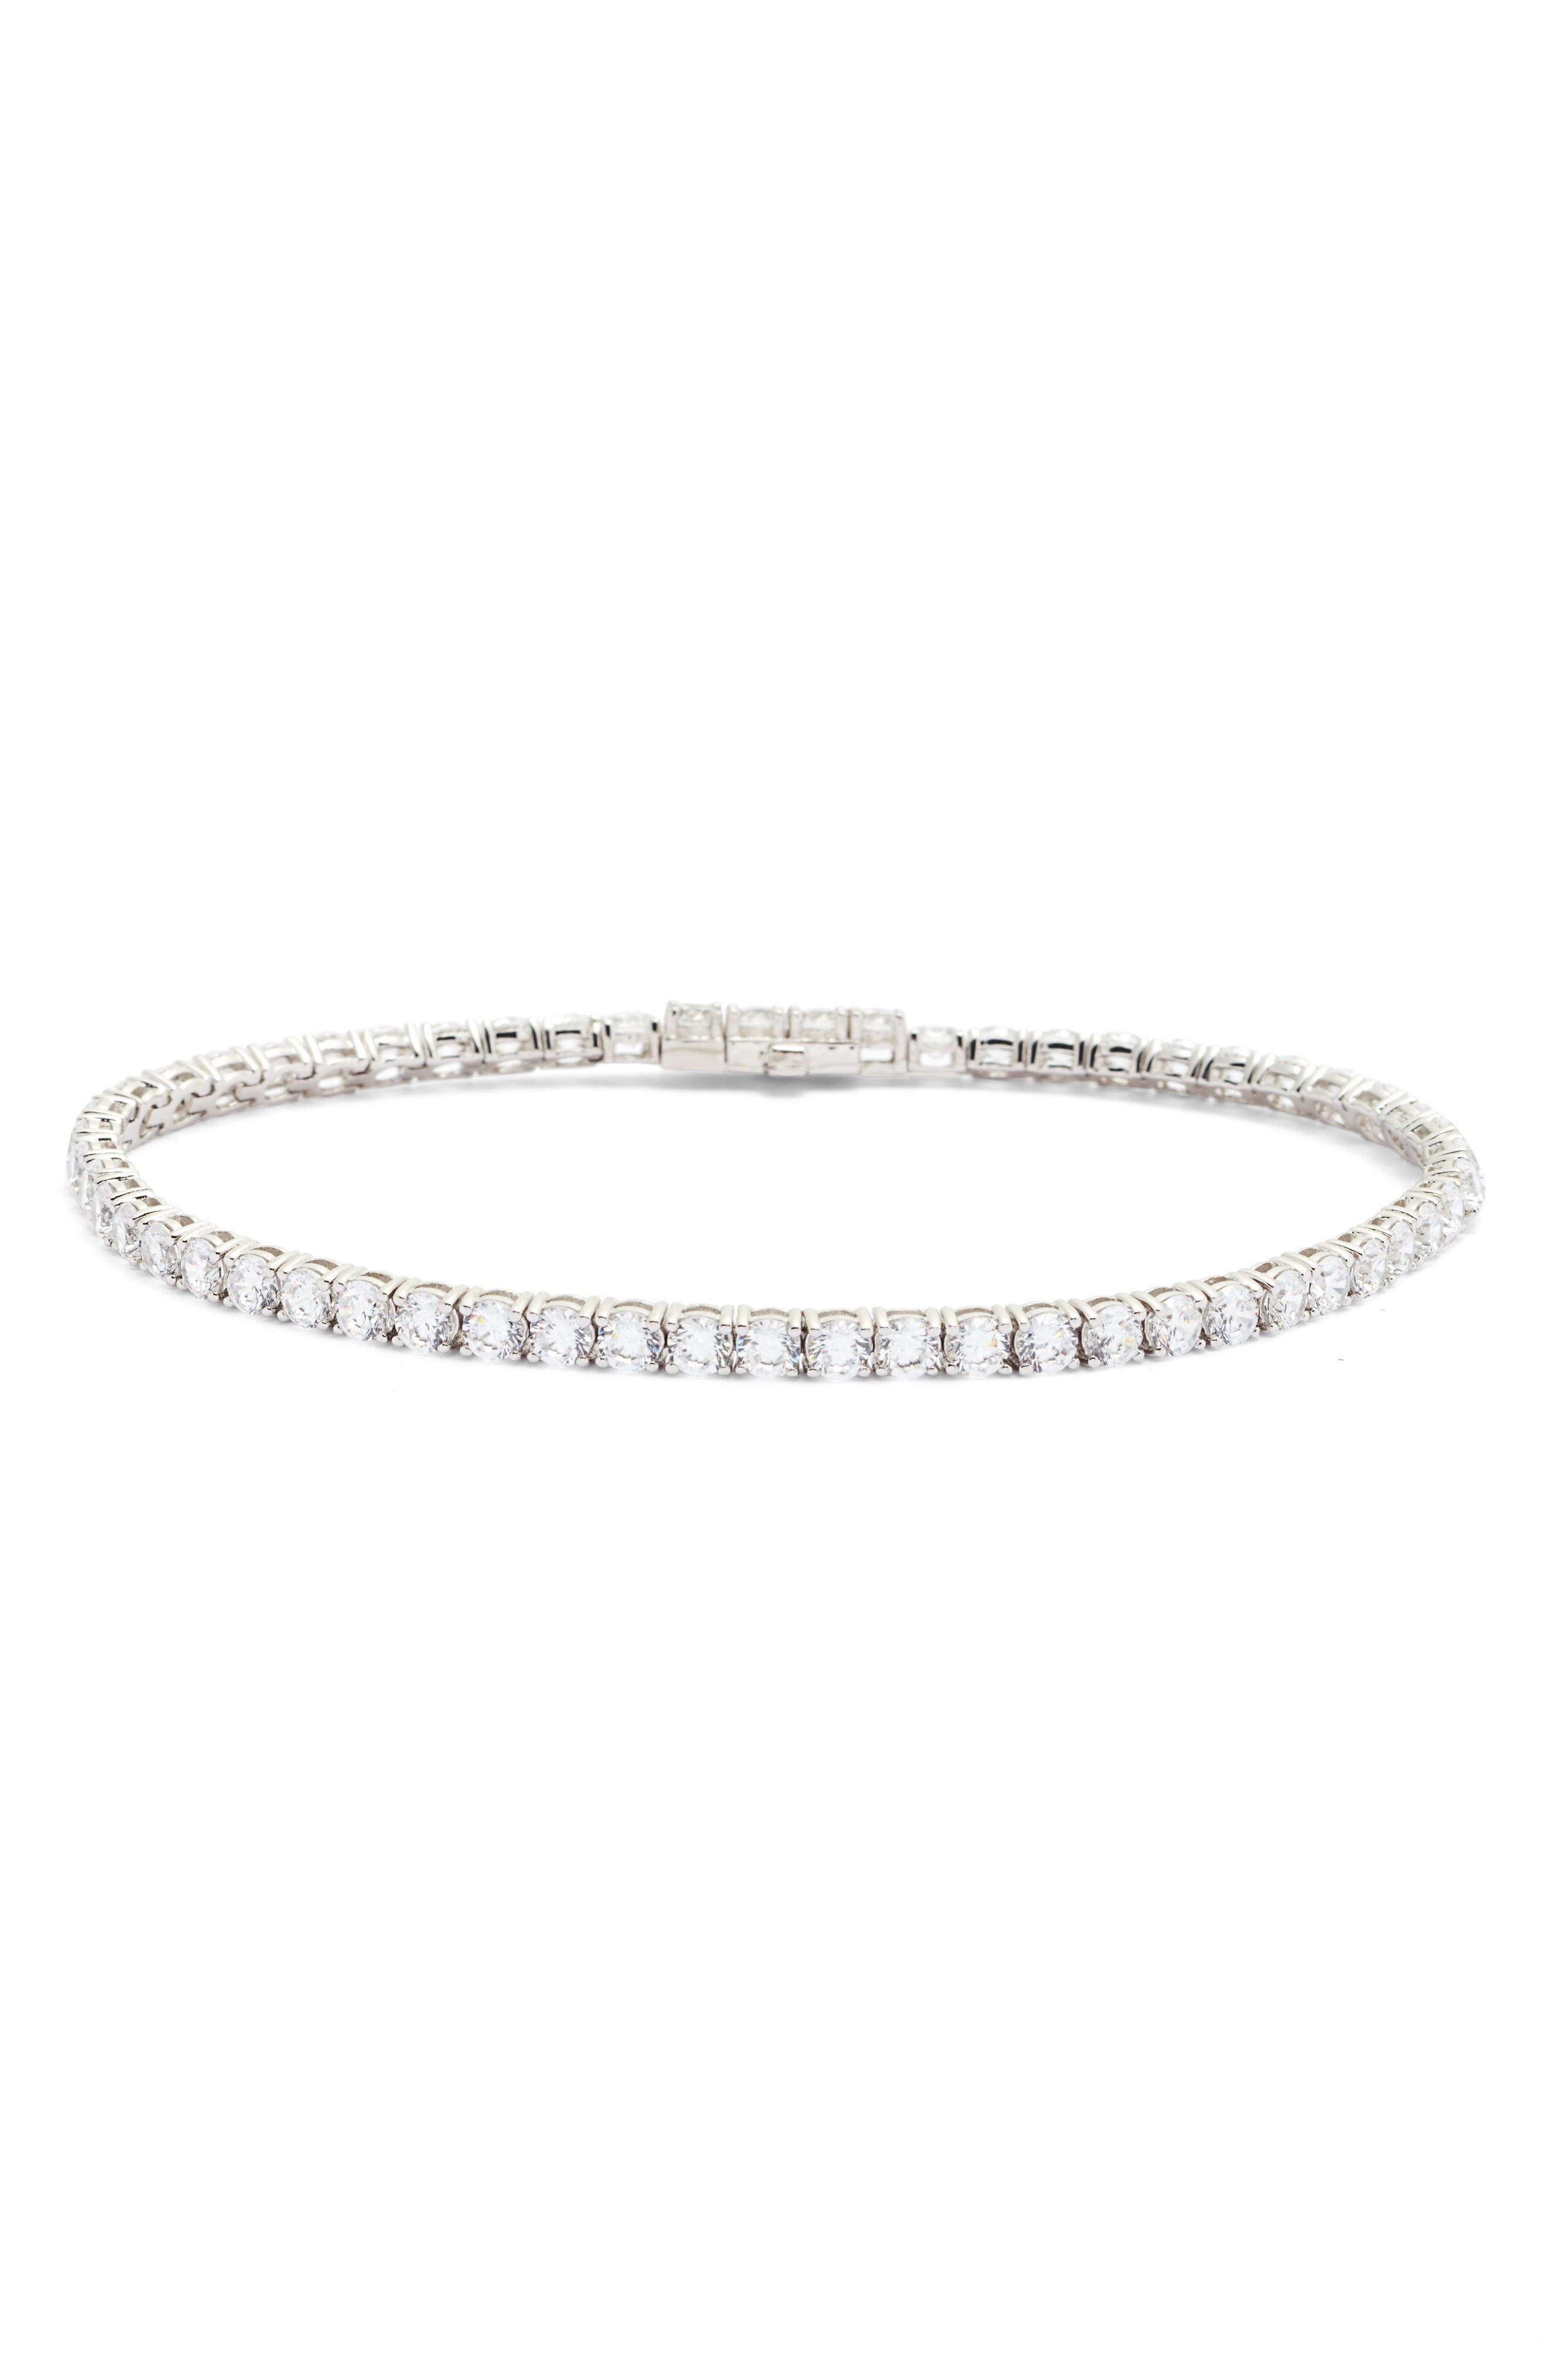 LAFONN Classic Simulated Diamond Tennis Bracelet